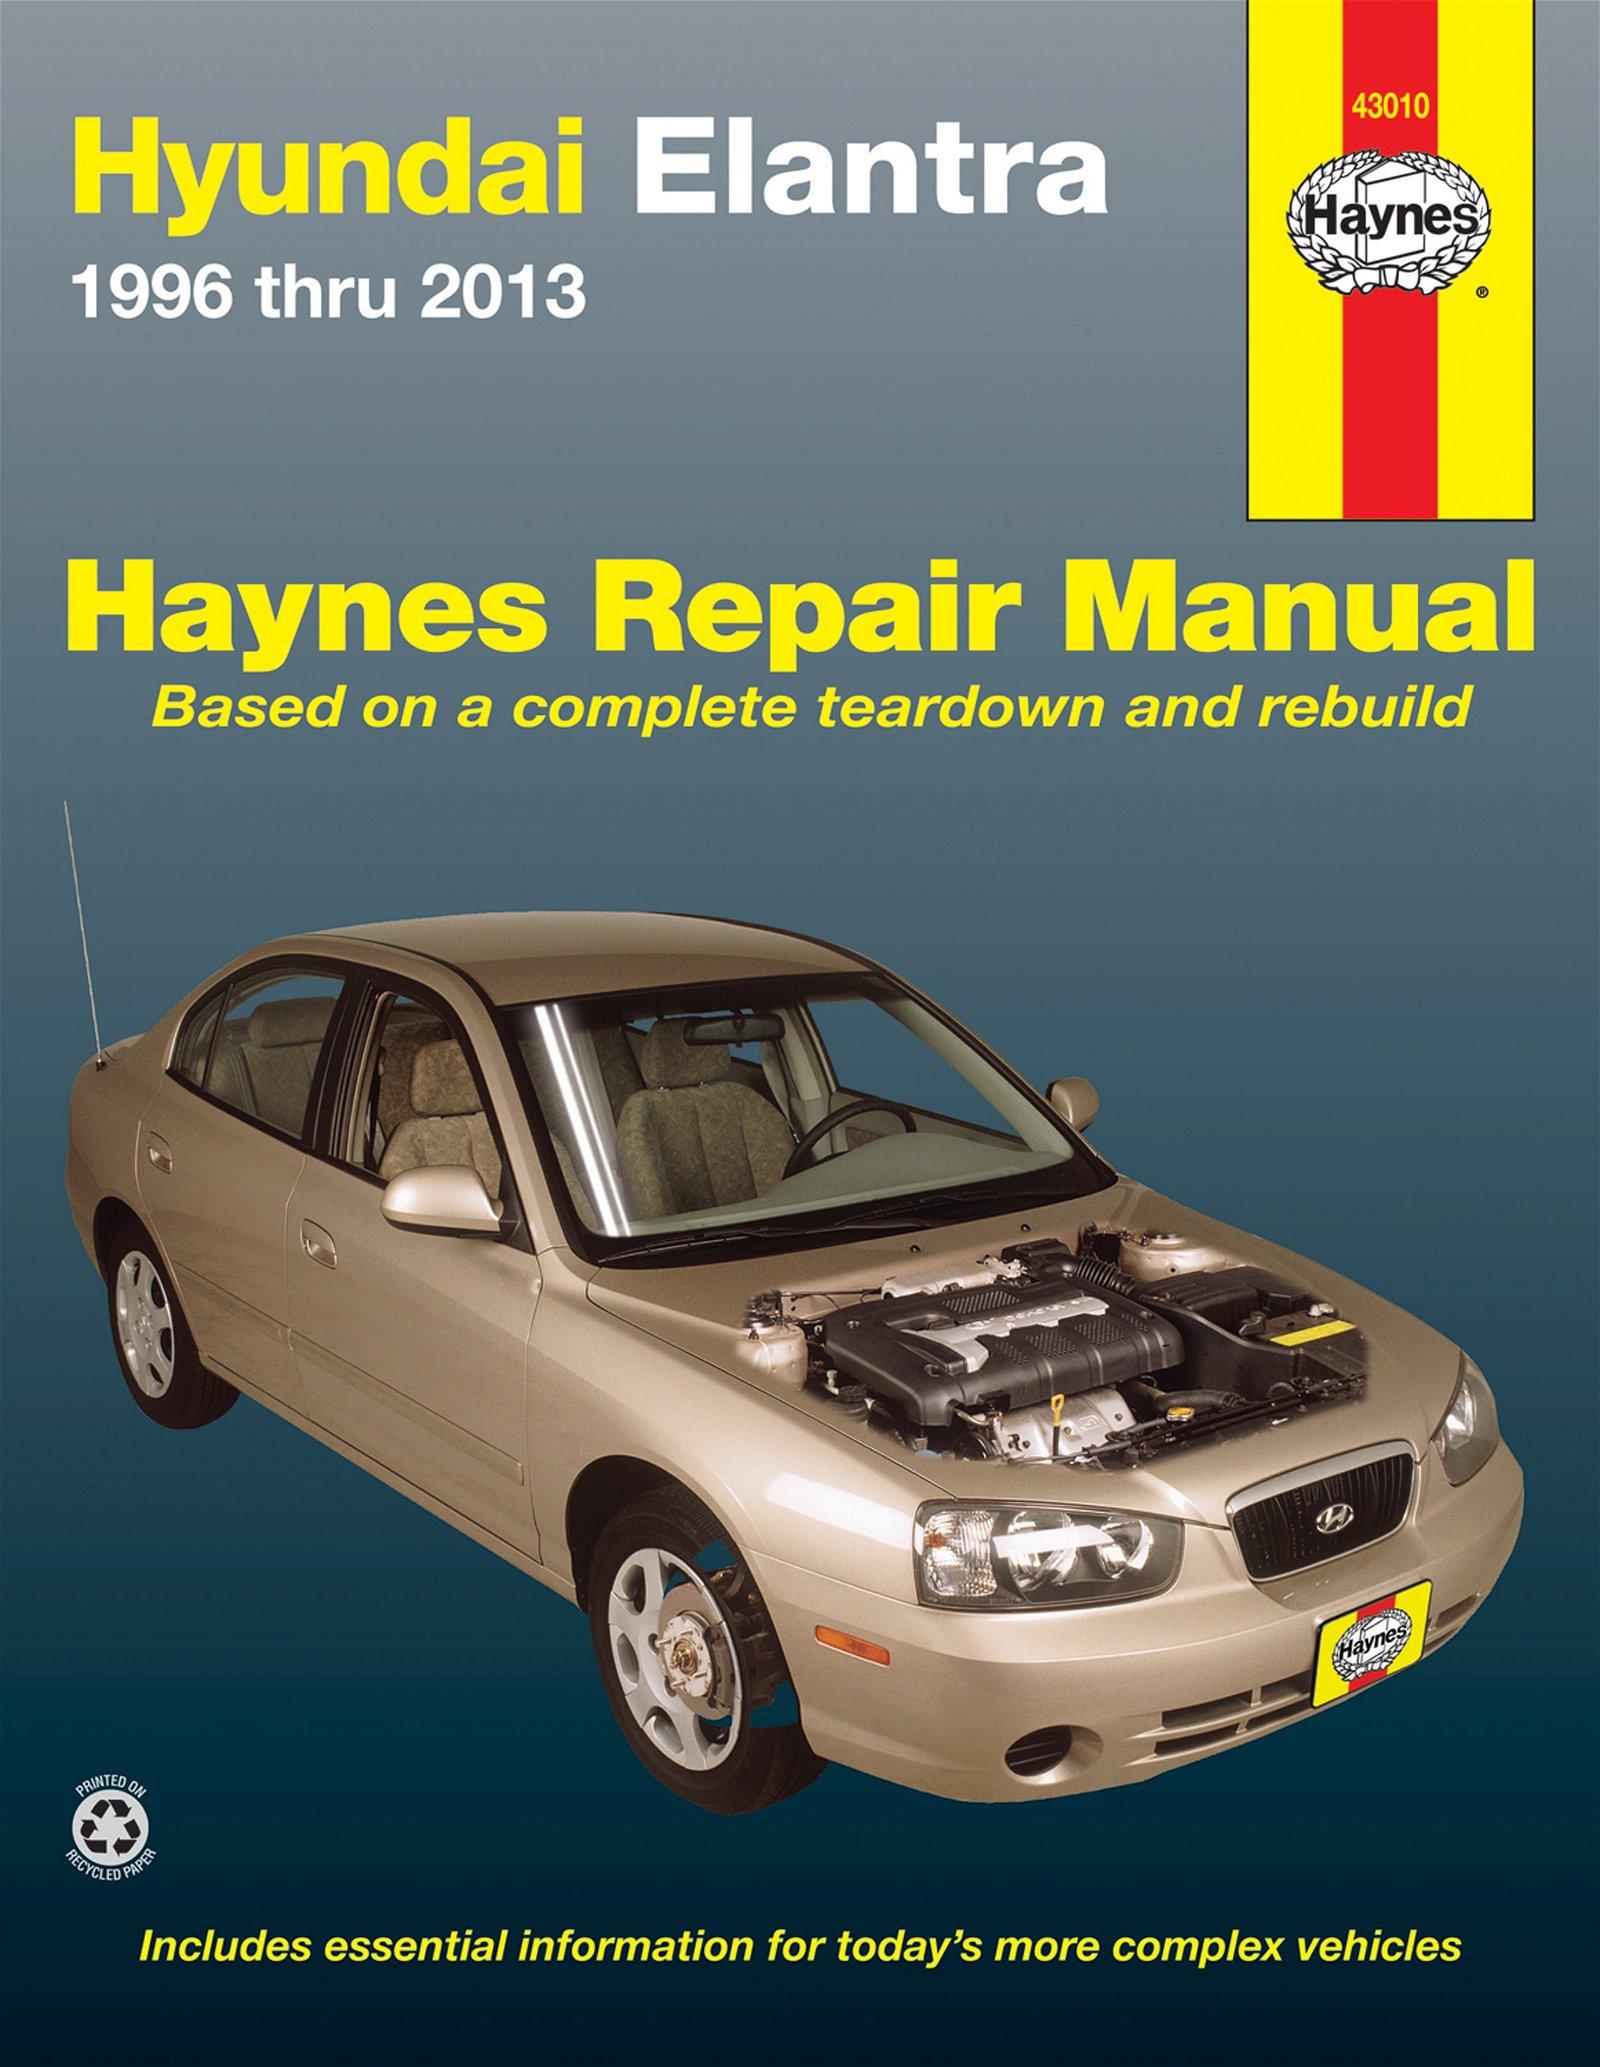 [Manuel US en Anglais] Hyundai Elantra  '96 -  '13